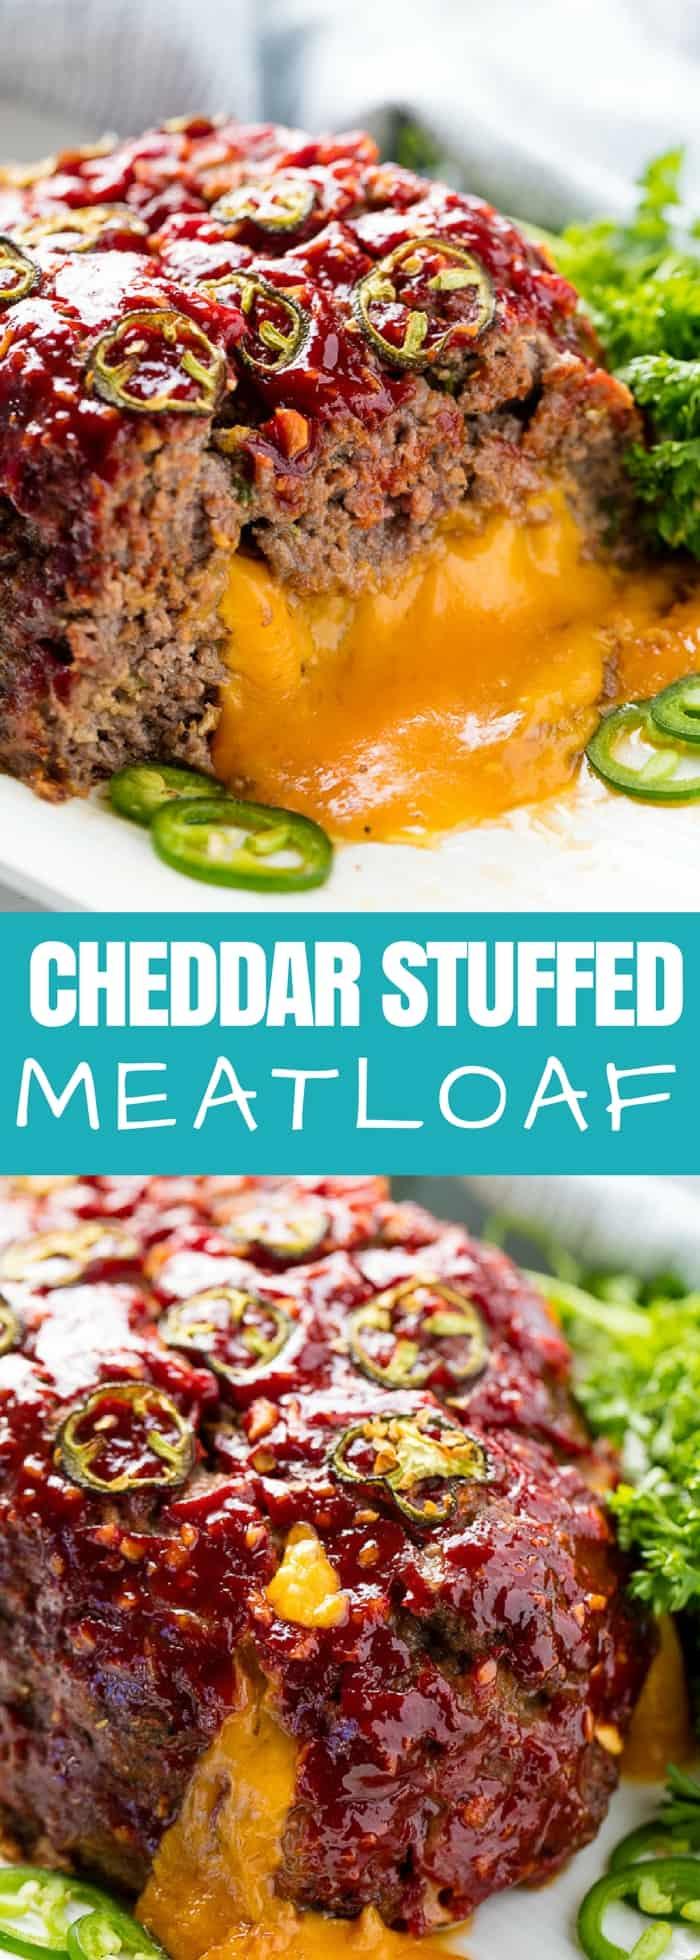 Jalapeno Cheddar Stuffed Meatloaf - thestayathomechef.com